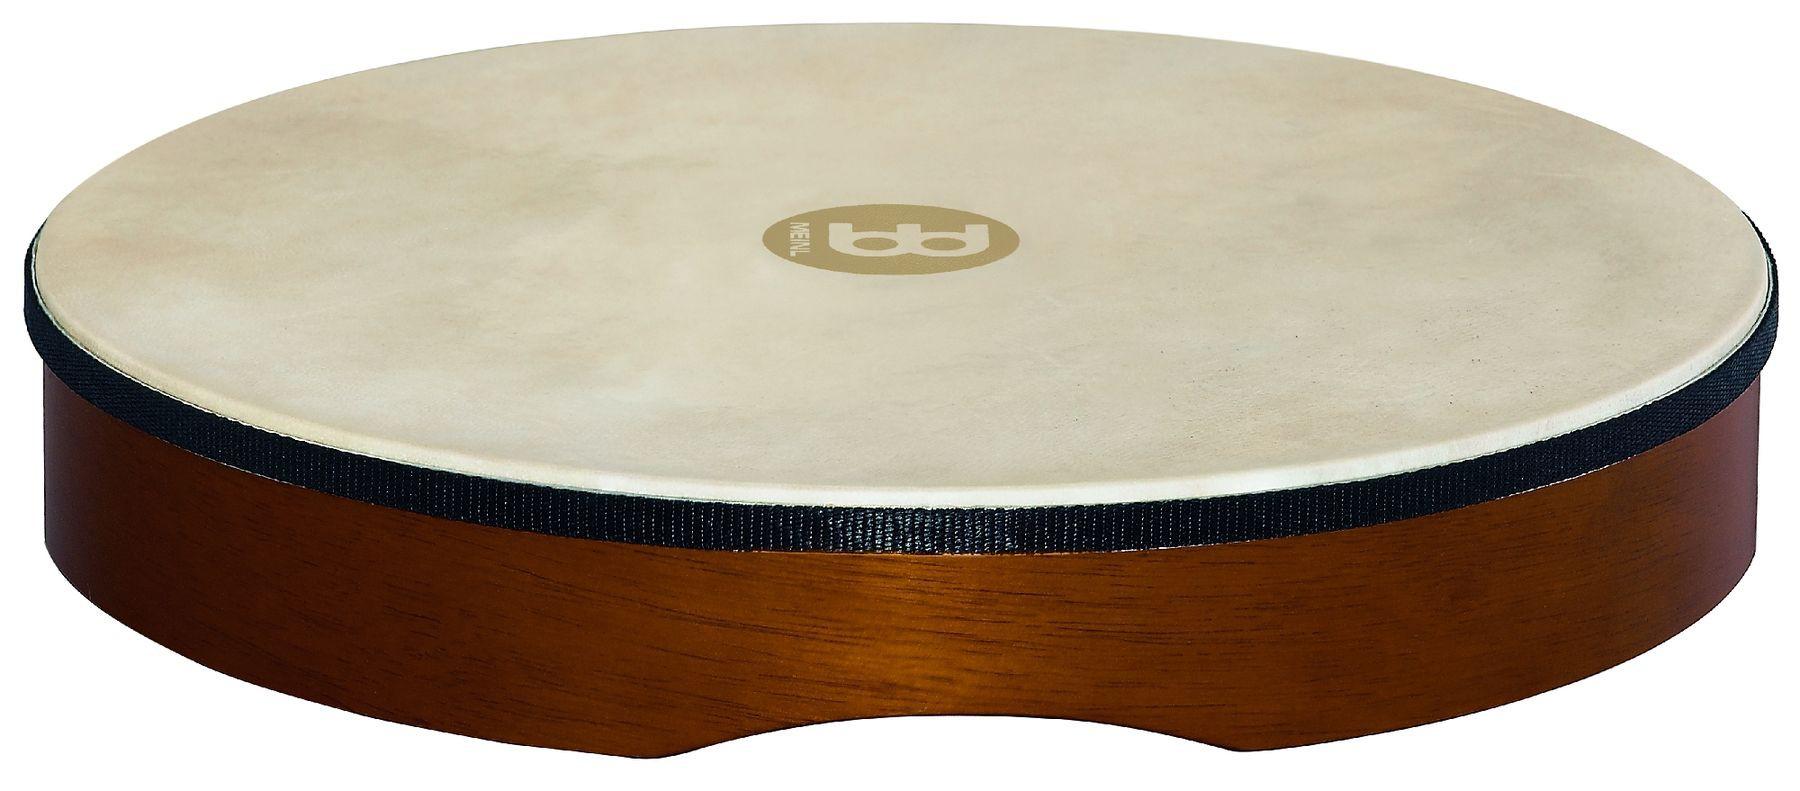 Pandero Meinl Cloudmusicstore HD16AB-TF lateral